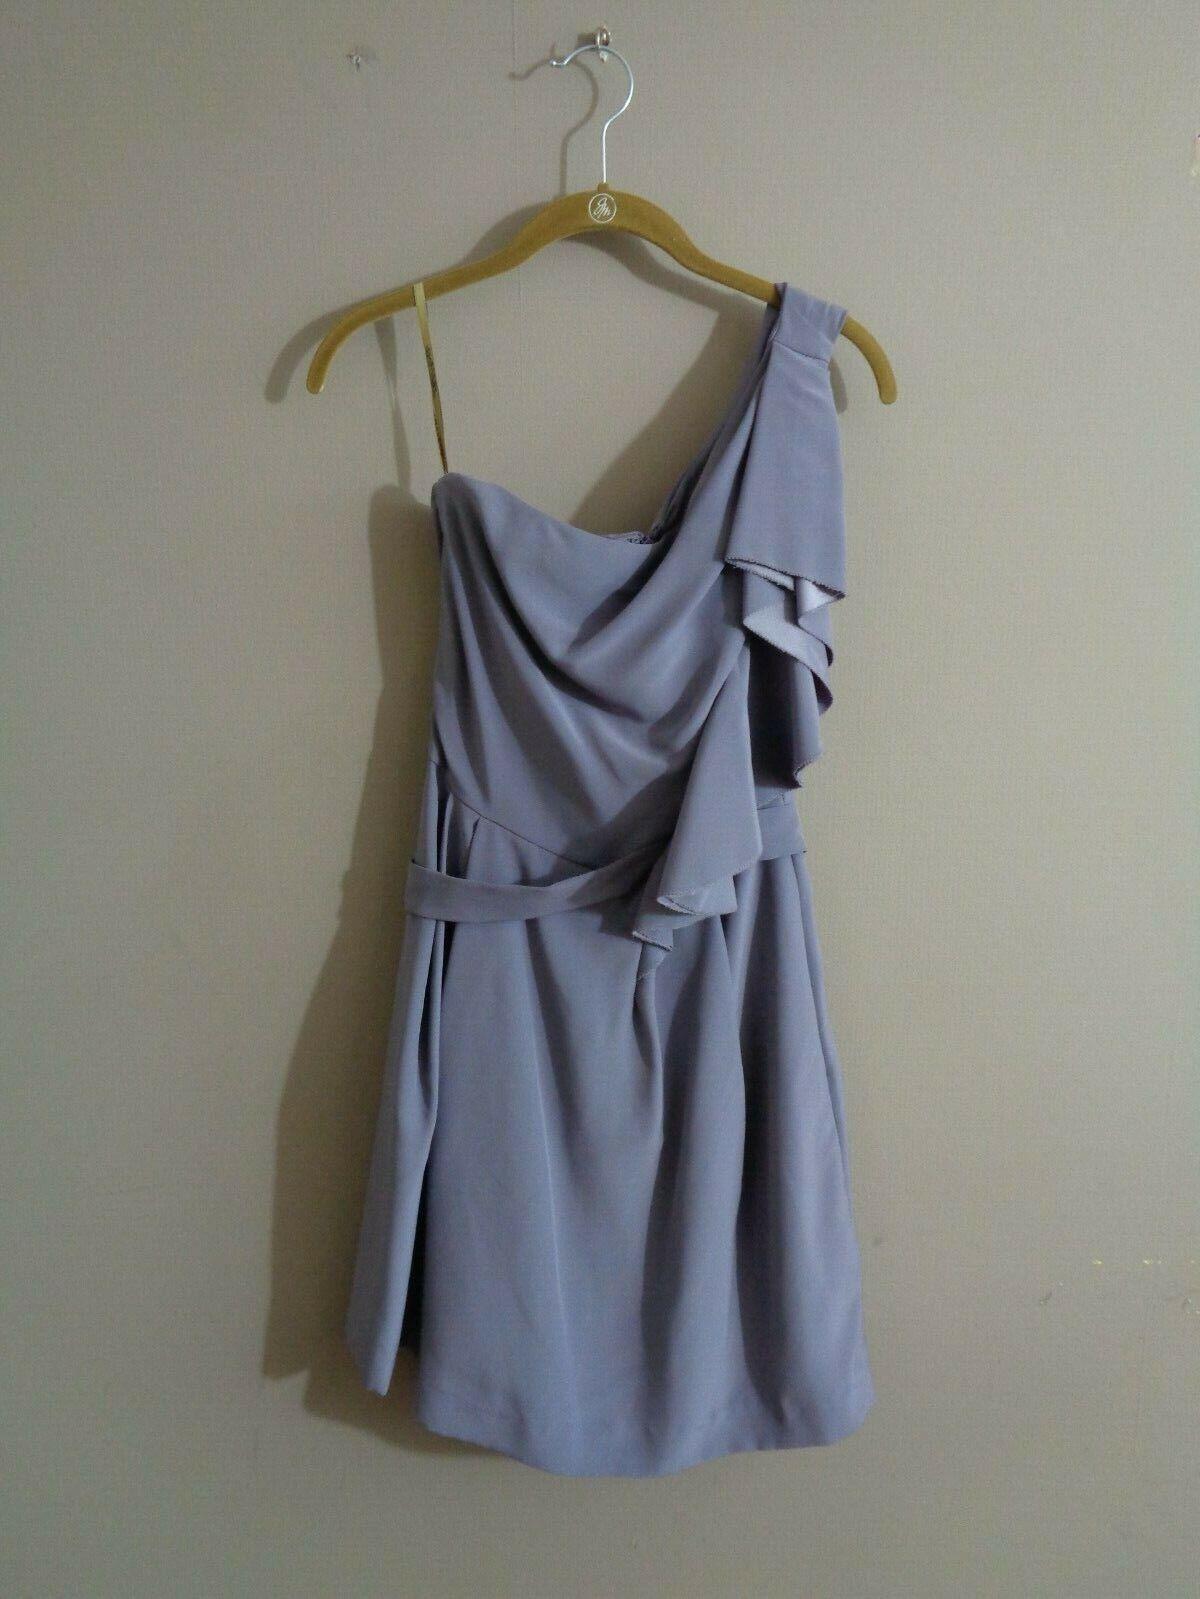 Lela Rose Bridesmaid Women's Sz 4 One Shoulder Dress in Wisteria Purple LR140XX